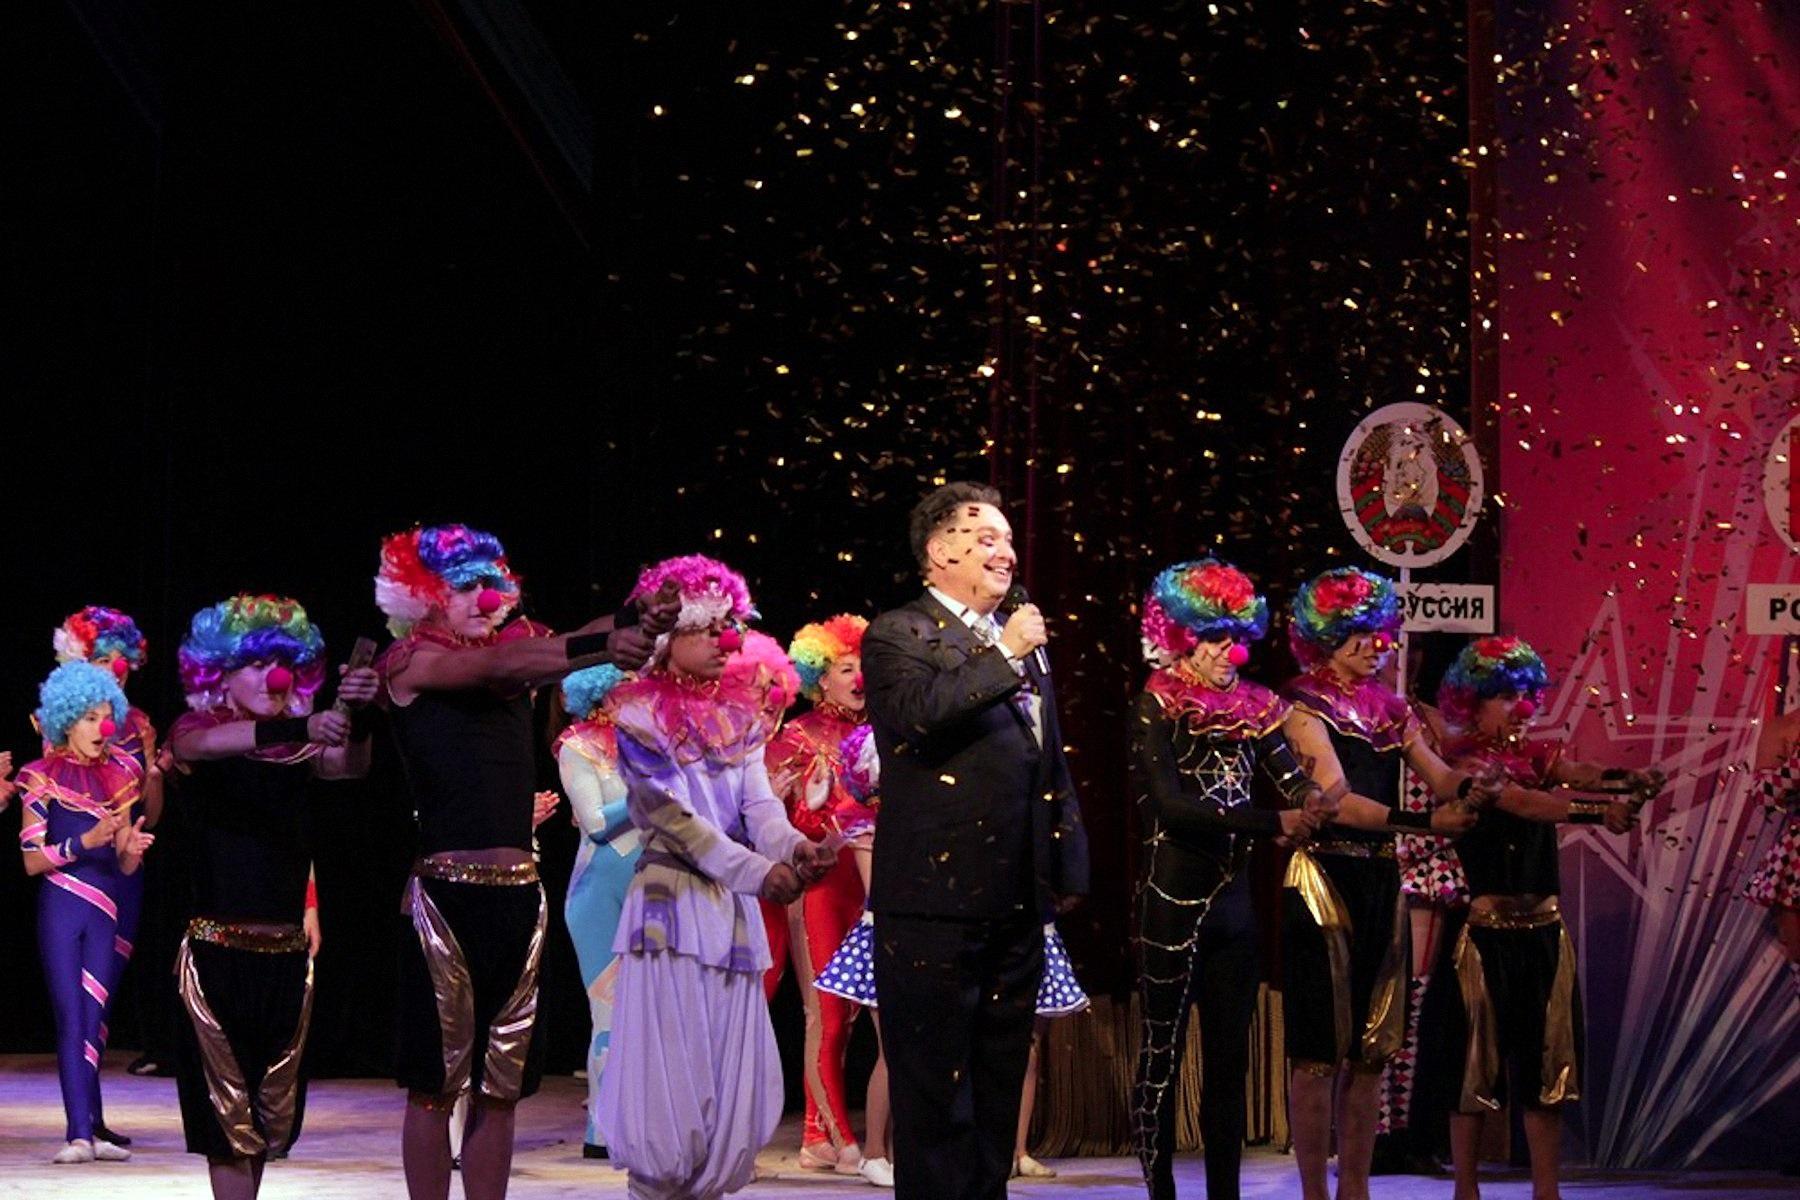 00 lnr lugask pr circus of the future 08 041015